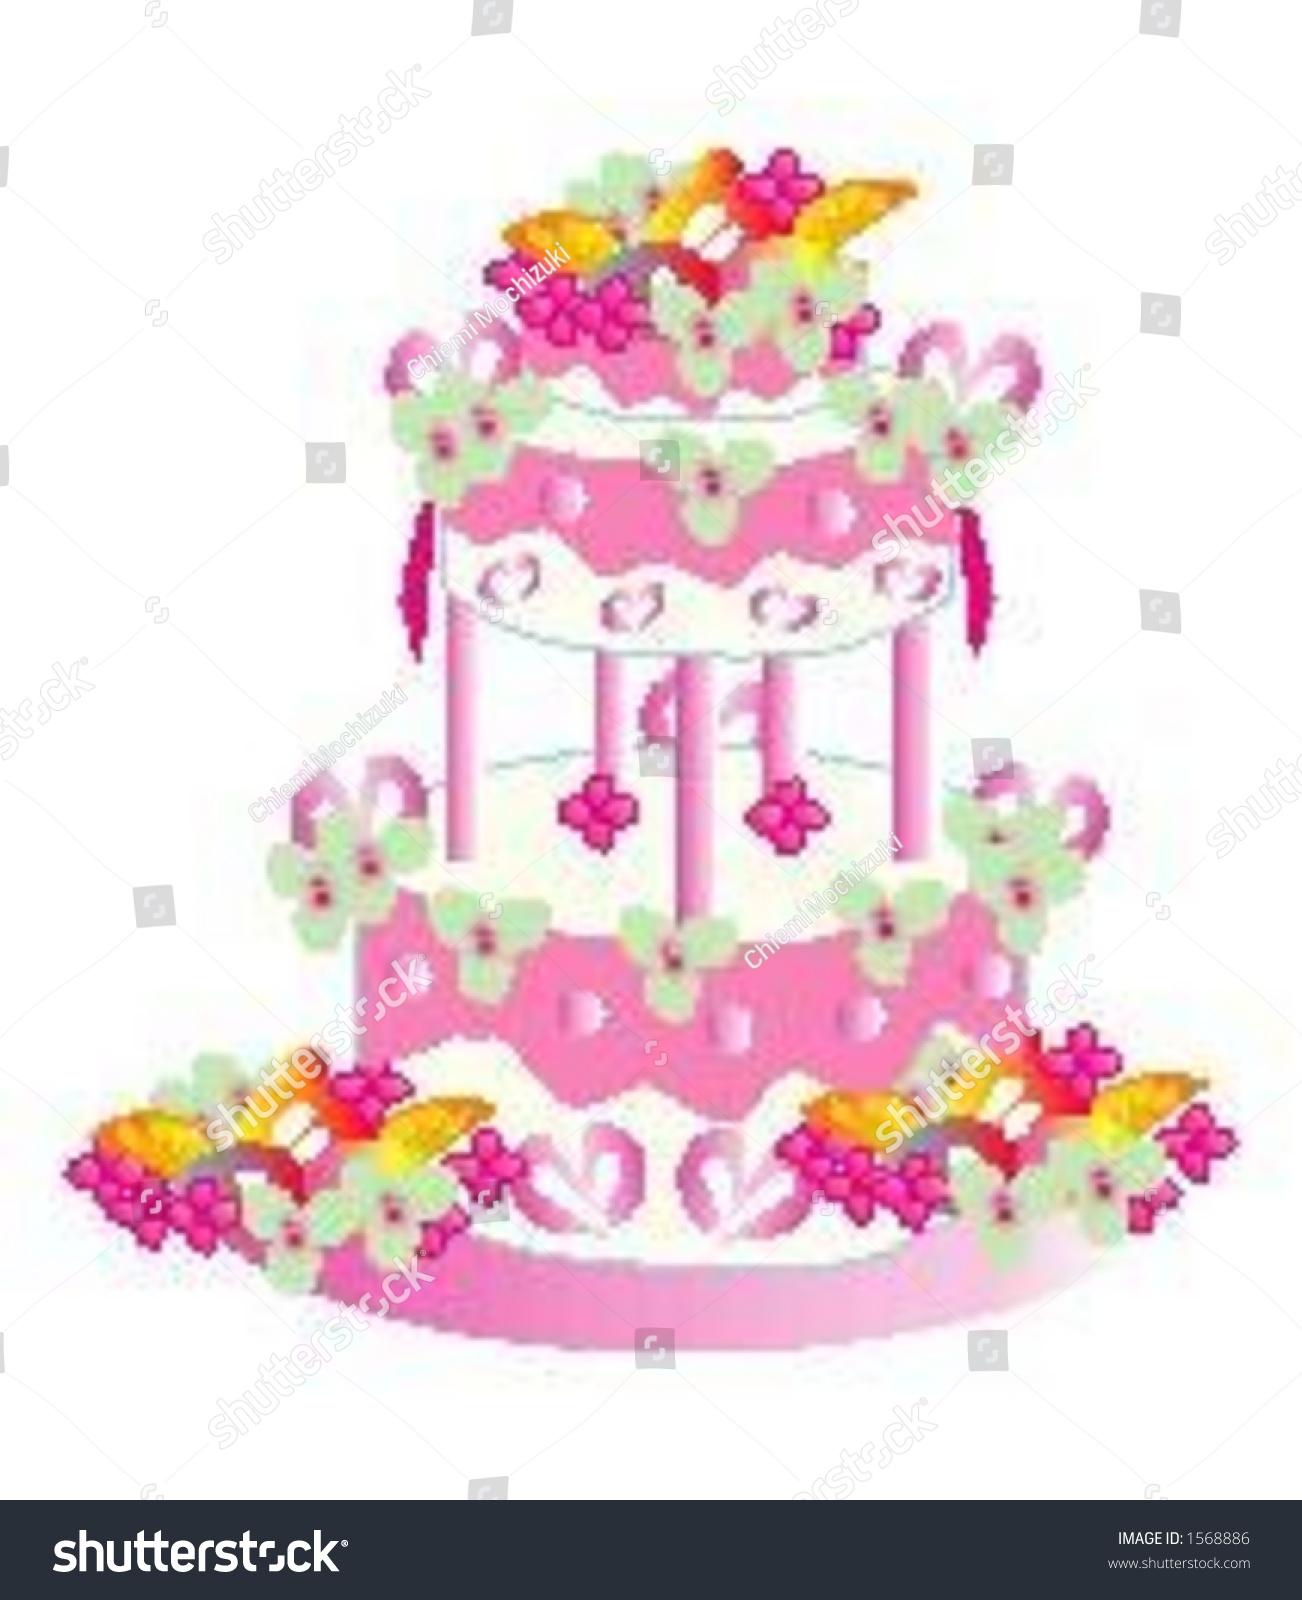 Vector Graphic Threetier Wedding Cake Stock Vector 1568886 ...